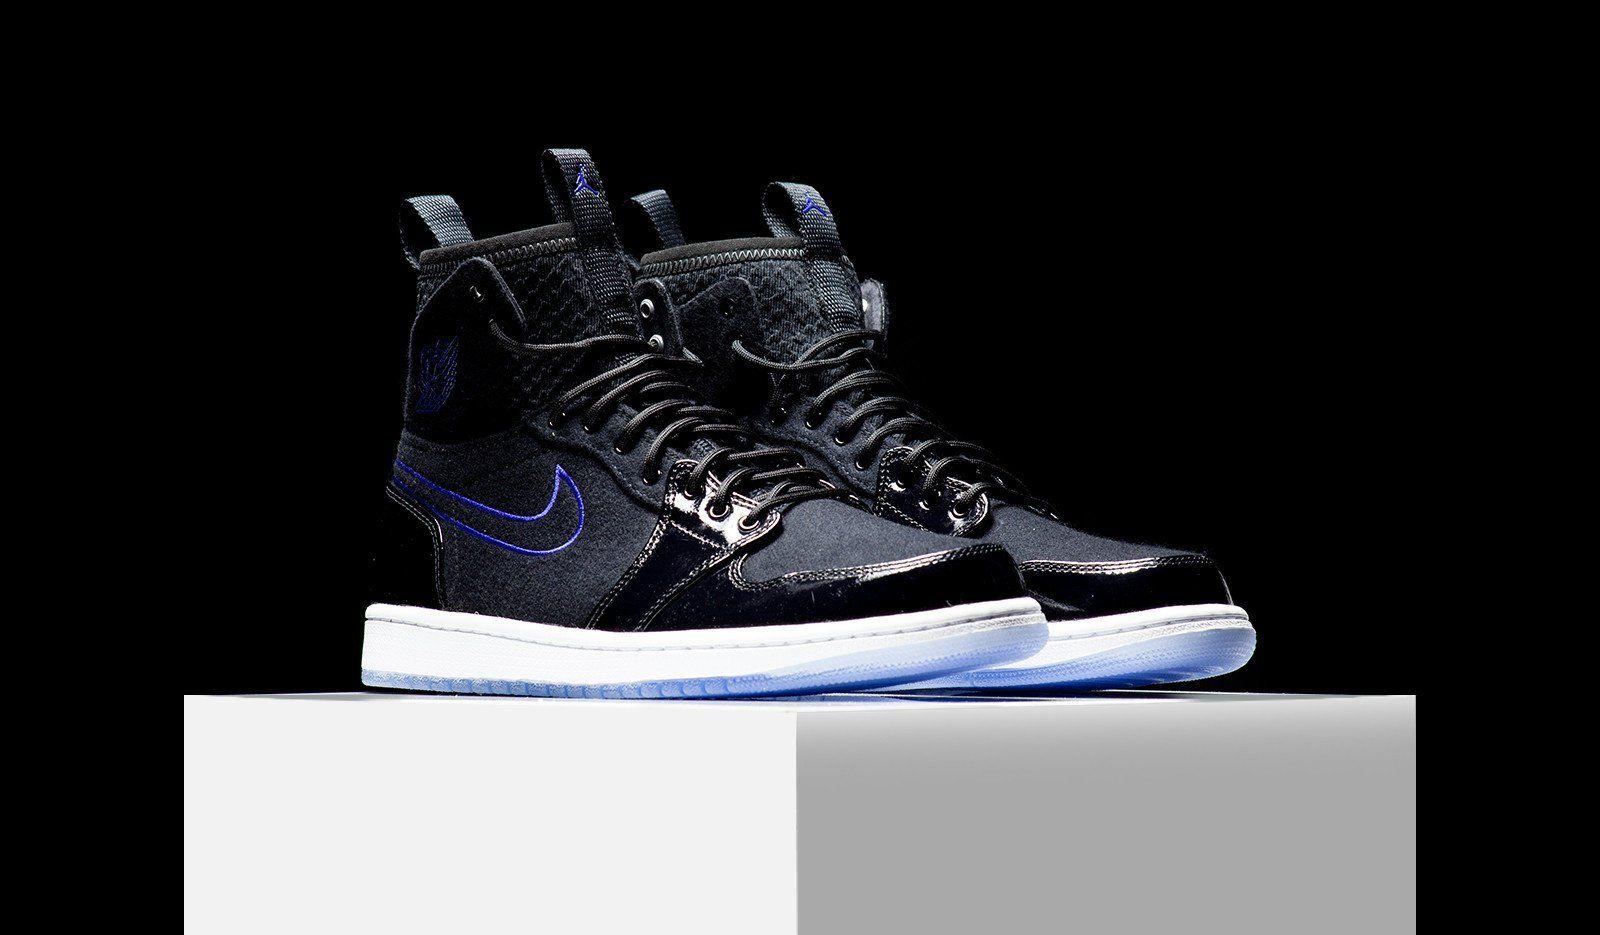 77f0ffa47048 Nike Air Jordan 1 Retro Ultra High (844700-002) Space Jam Collection ...